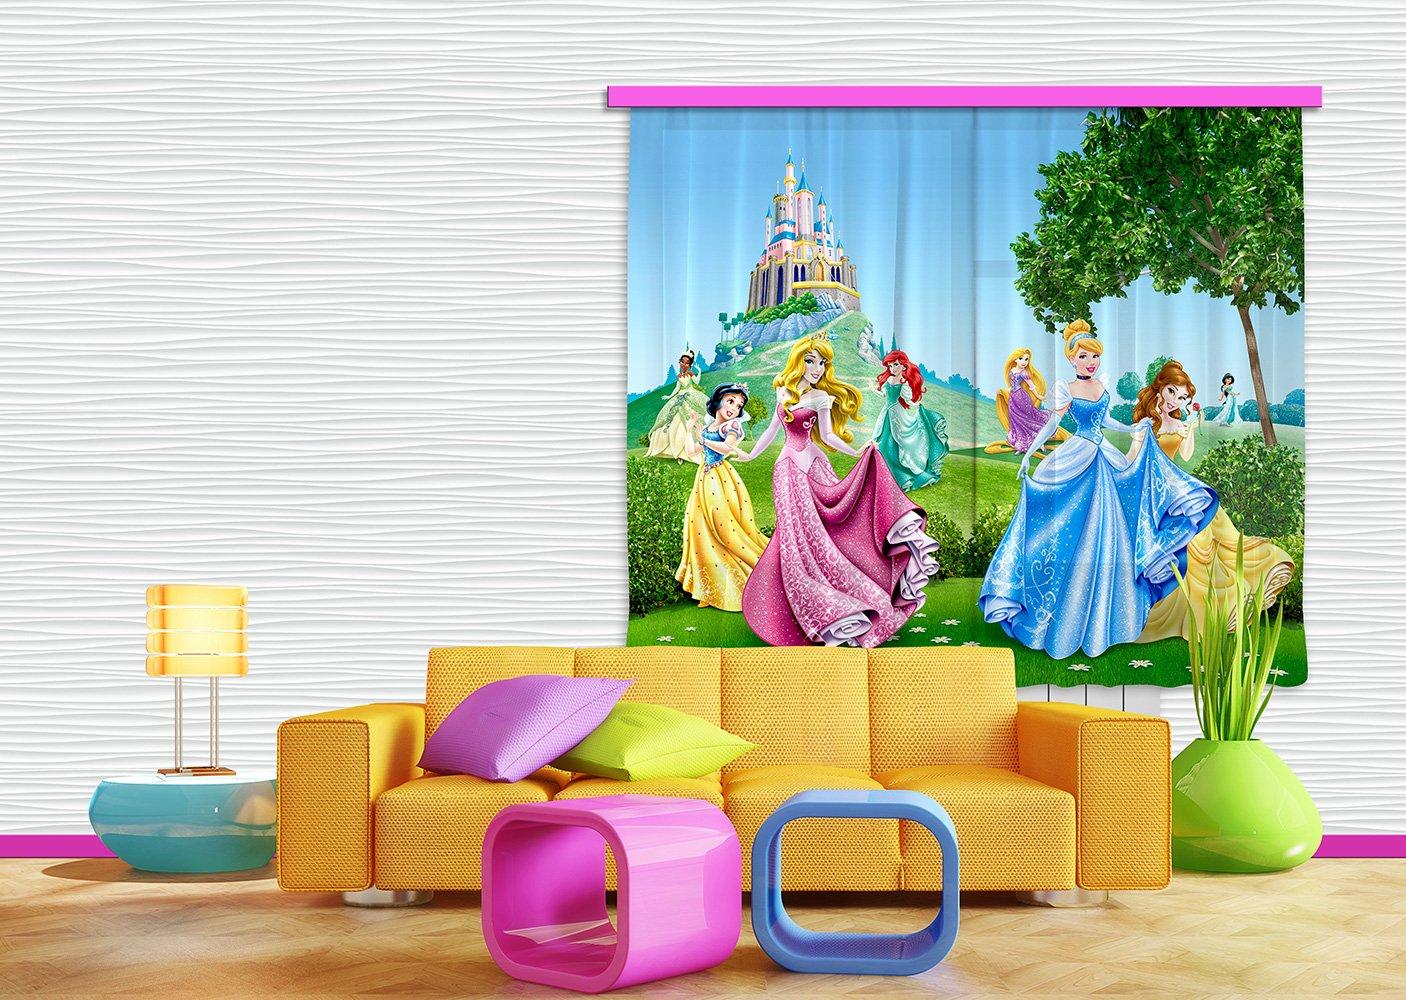 AG Design FCS xl 4319 - Tende per camera bambini, motivo principesse Disney FCSXL 4319